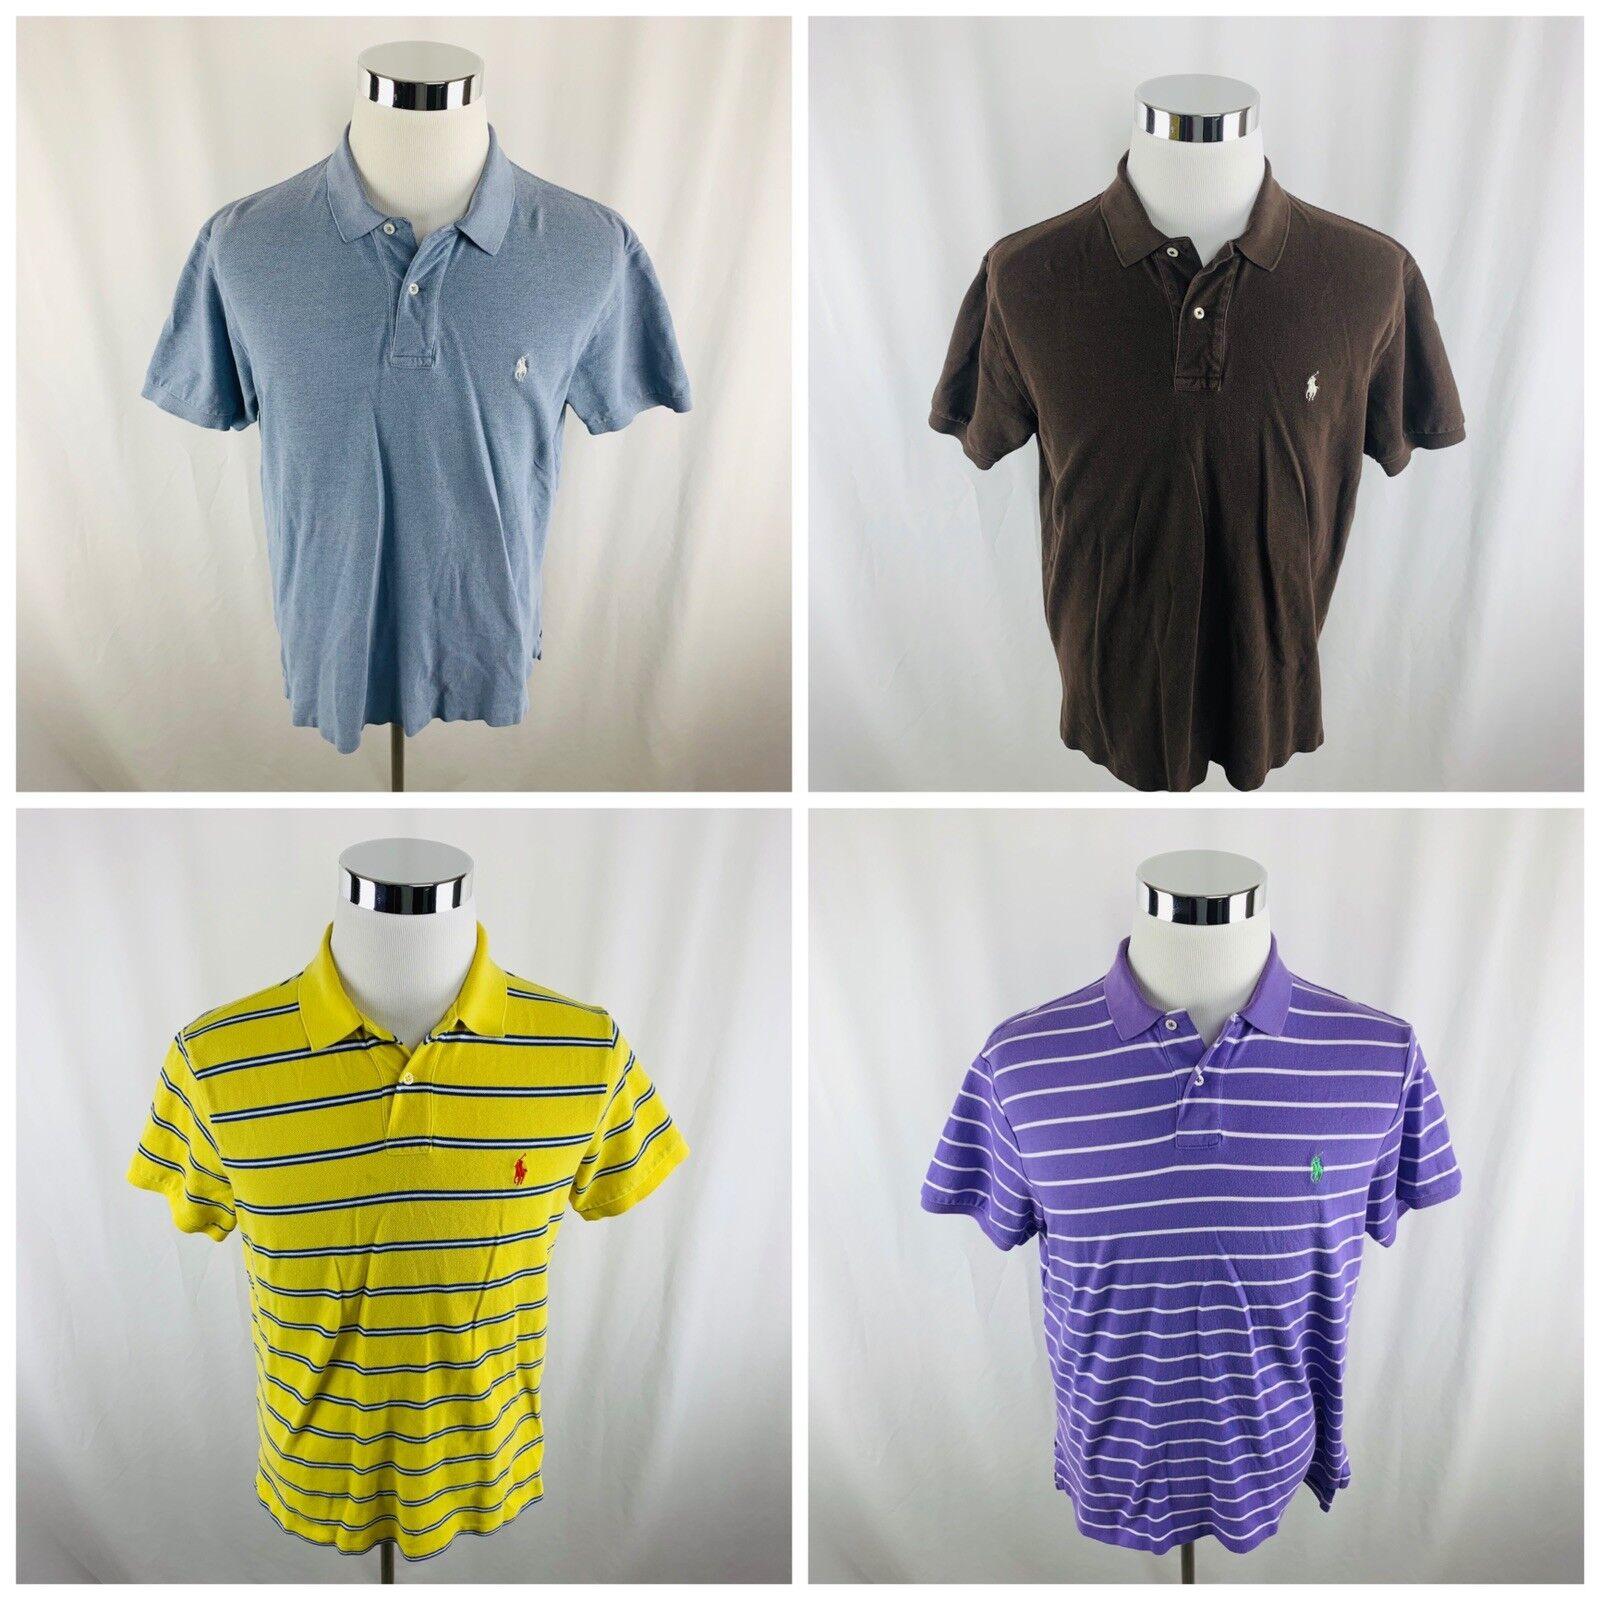 7b513a85443b of Polo Ralph Lauren Mens Large Short Sleeve Polo Shirts 4 Lot ...